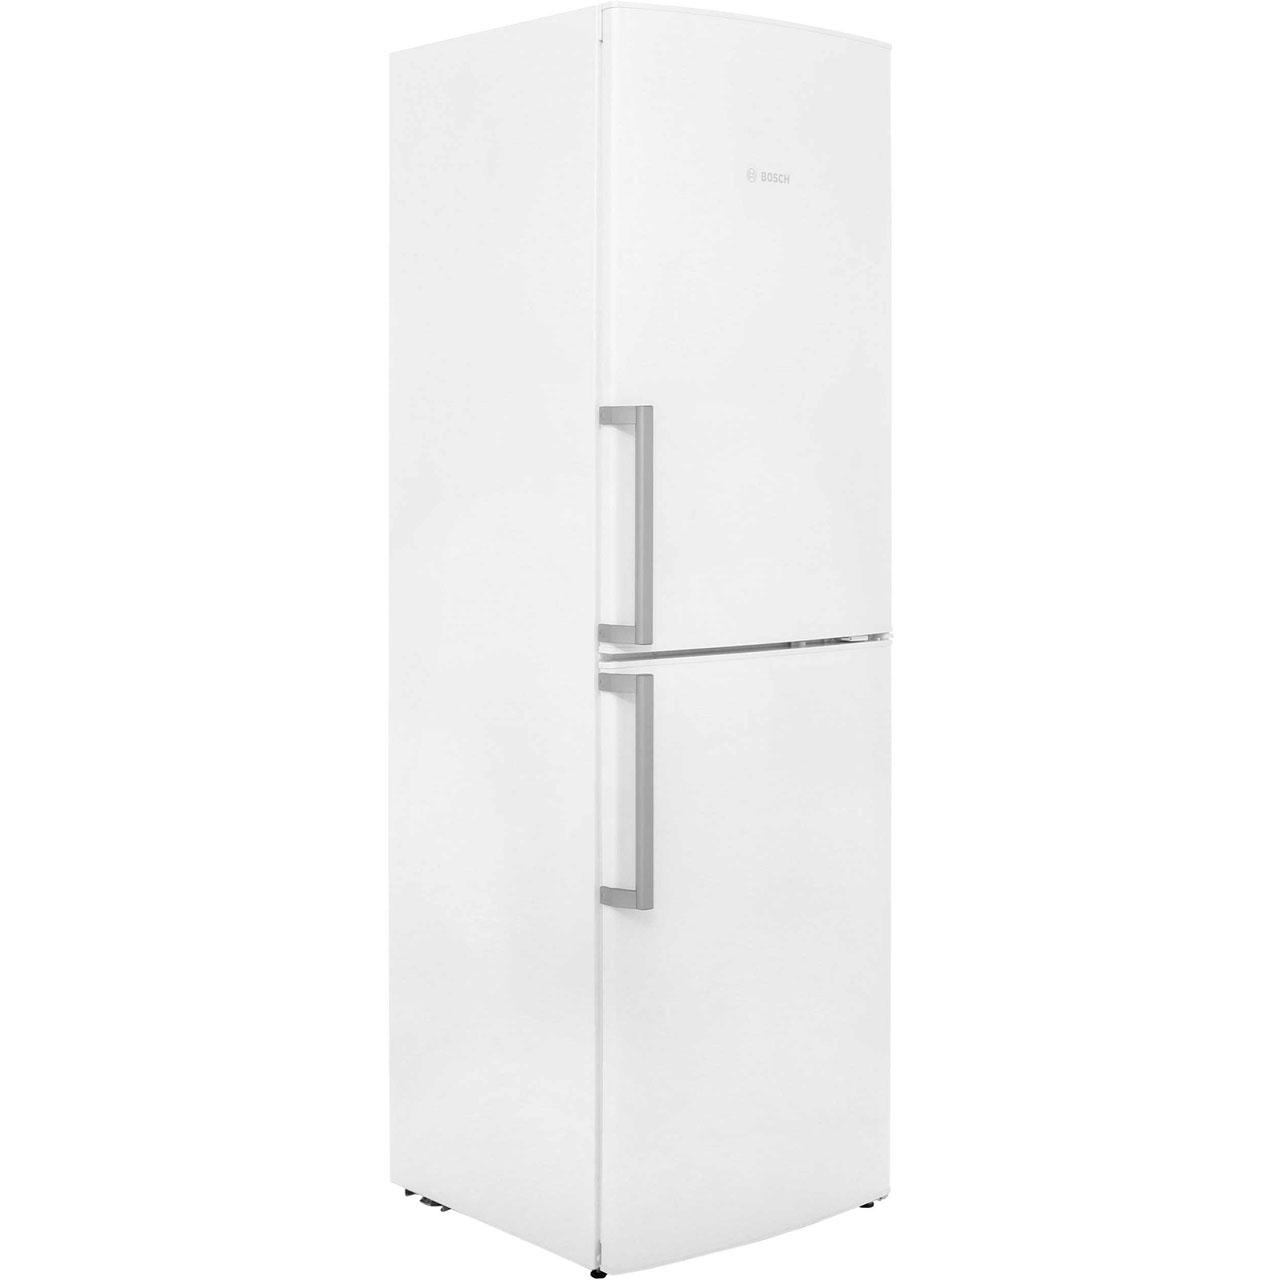 Bosch Serie 4 KGN34VW26G Free Standing Fridge Freezer Frost Free in White